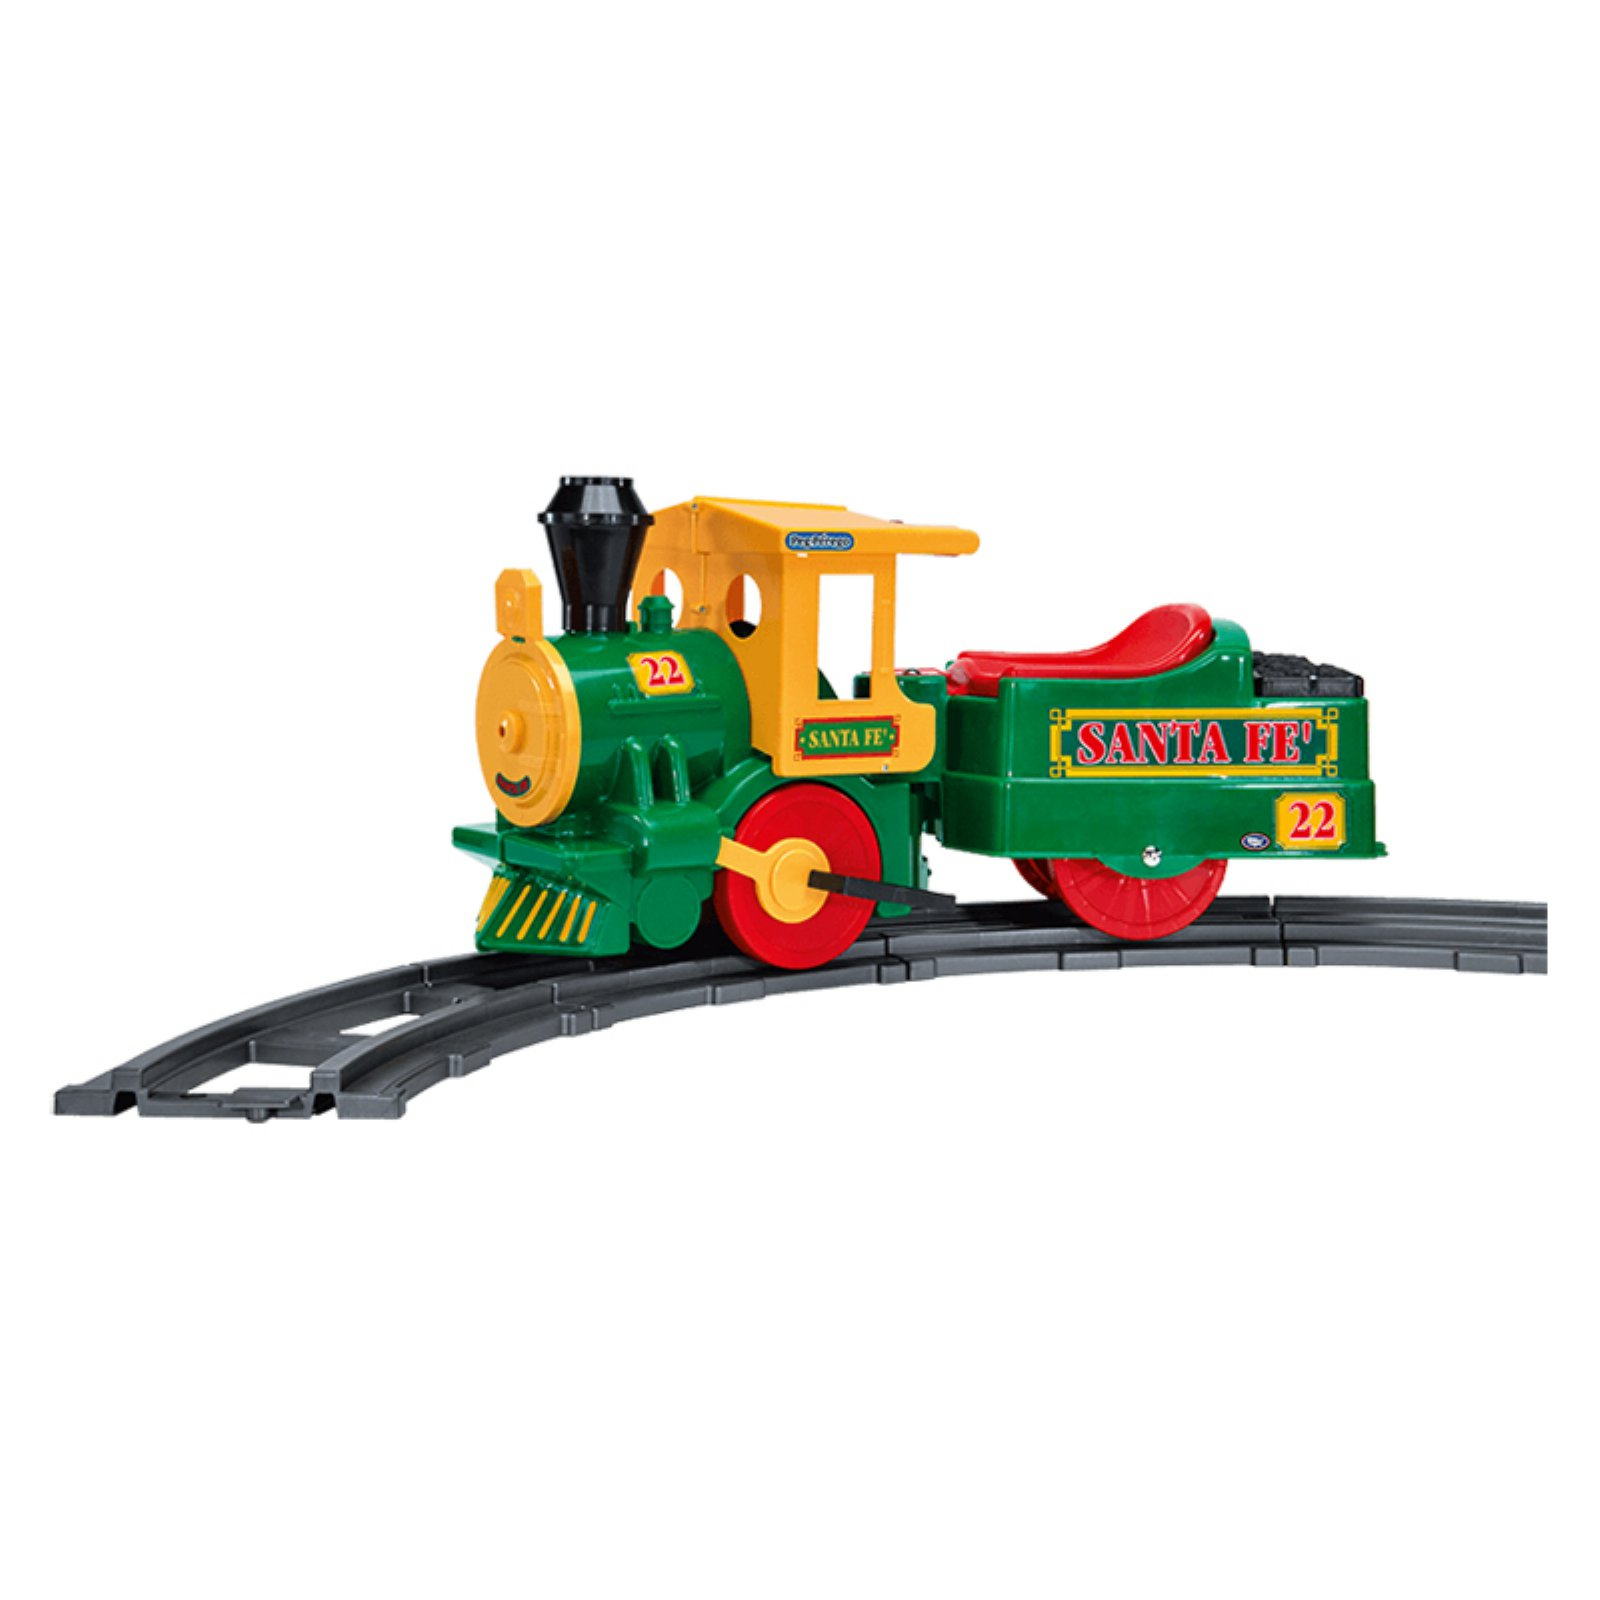 Peg Perego Santa Fe Train Battery Powered Riding Toy by